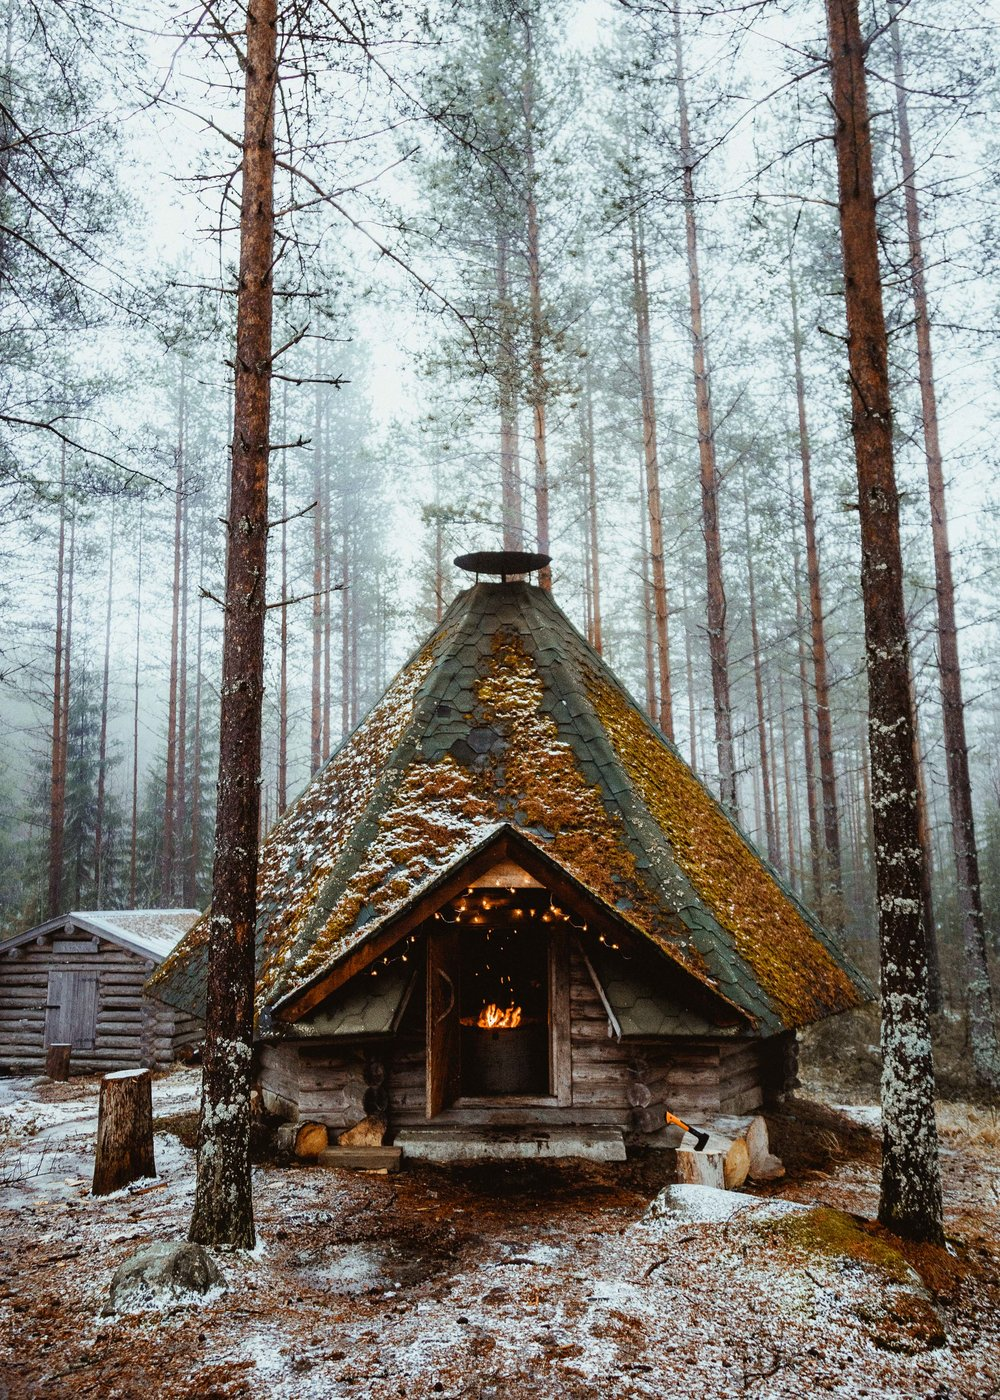 41-finland-camping-cabin-kota-hut-campfire-winter-anna-elina-lahti-photographer.jpg